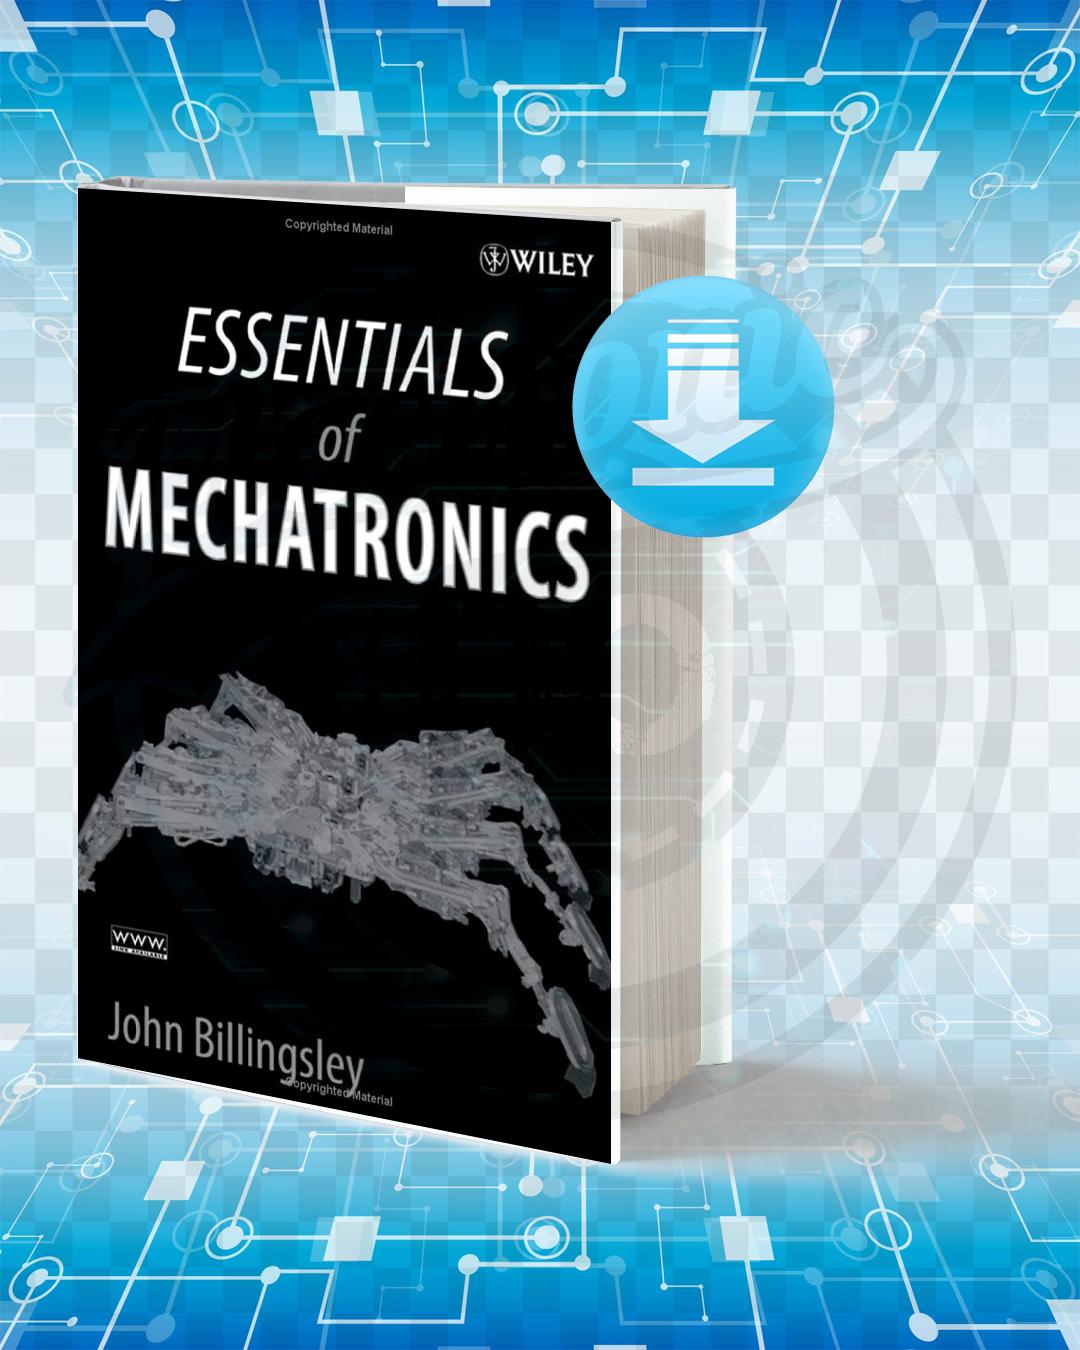 Msd case study topics for mechatronics